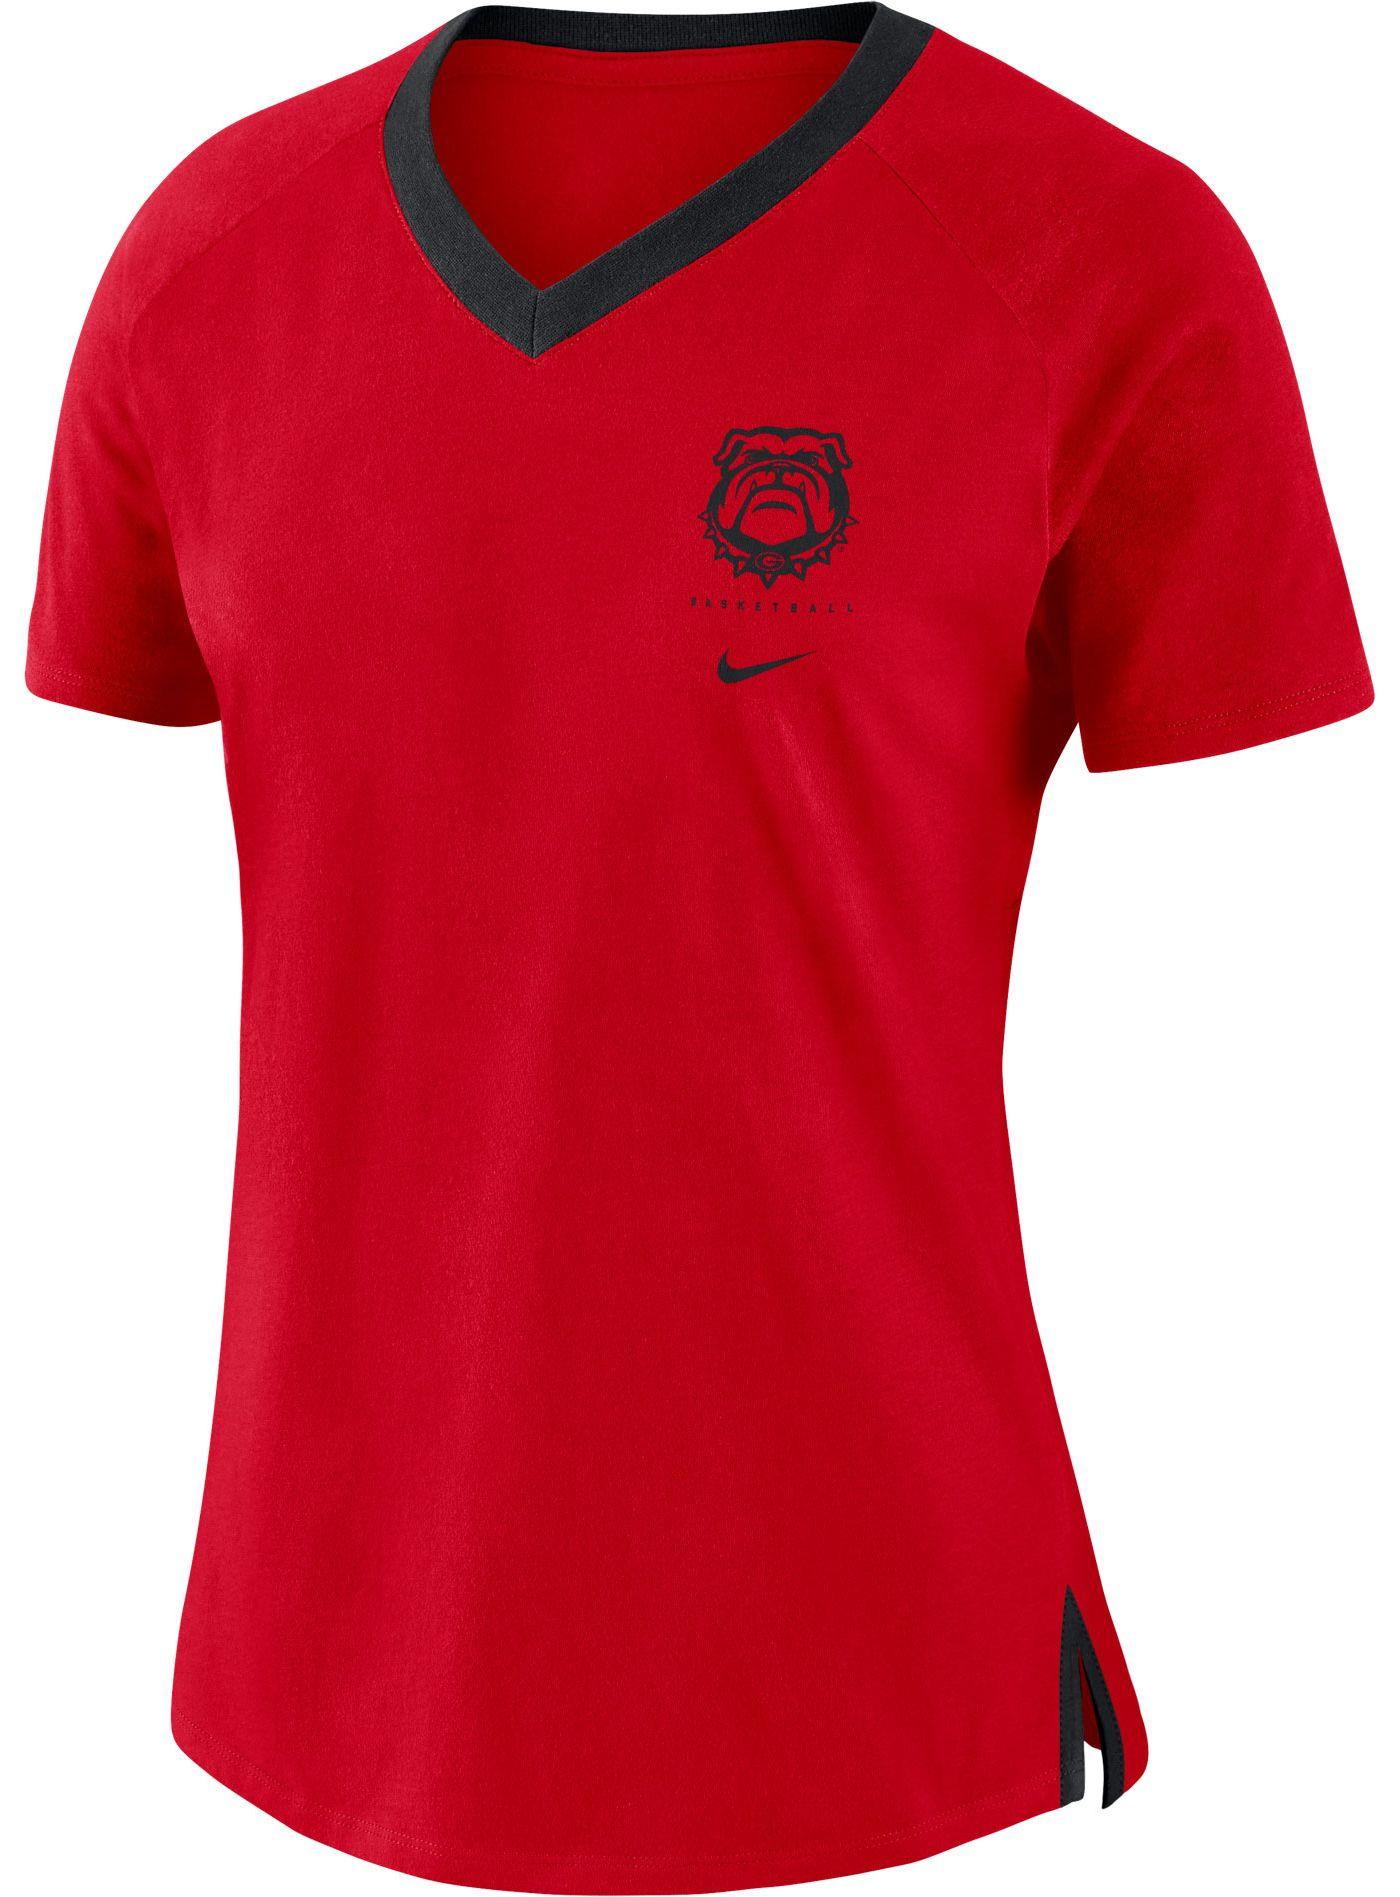 Nike Women's Georgia Bulldogs Red Tri-Blend Basketball Fan T-Shirt